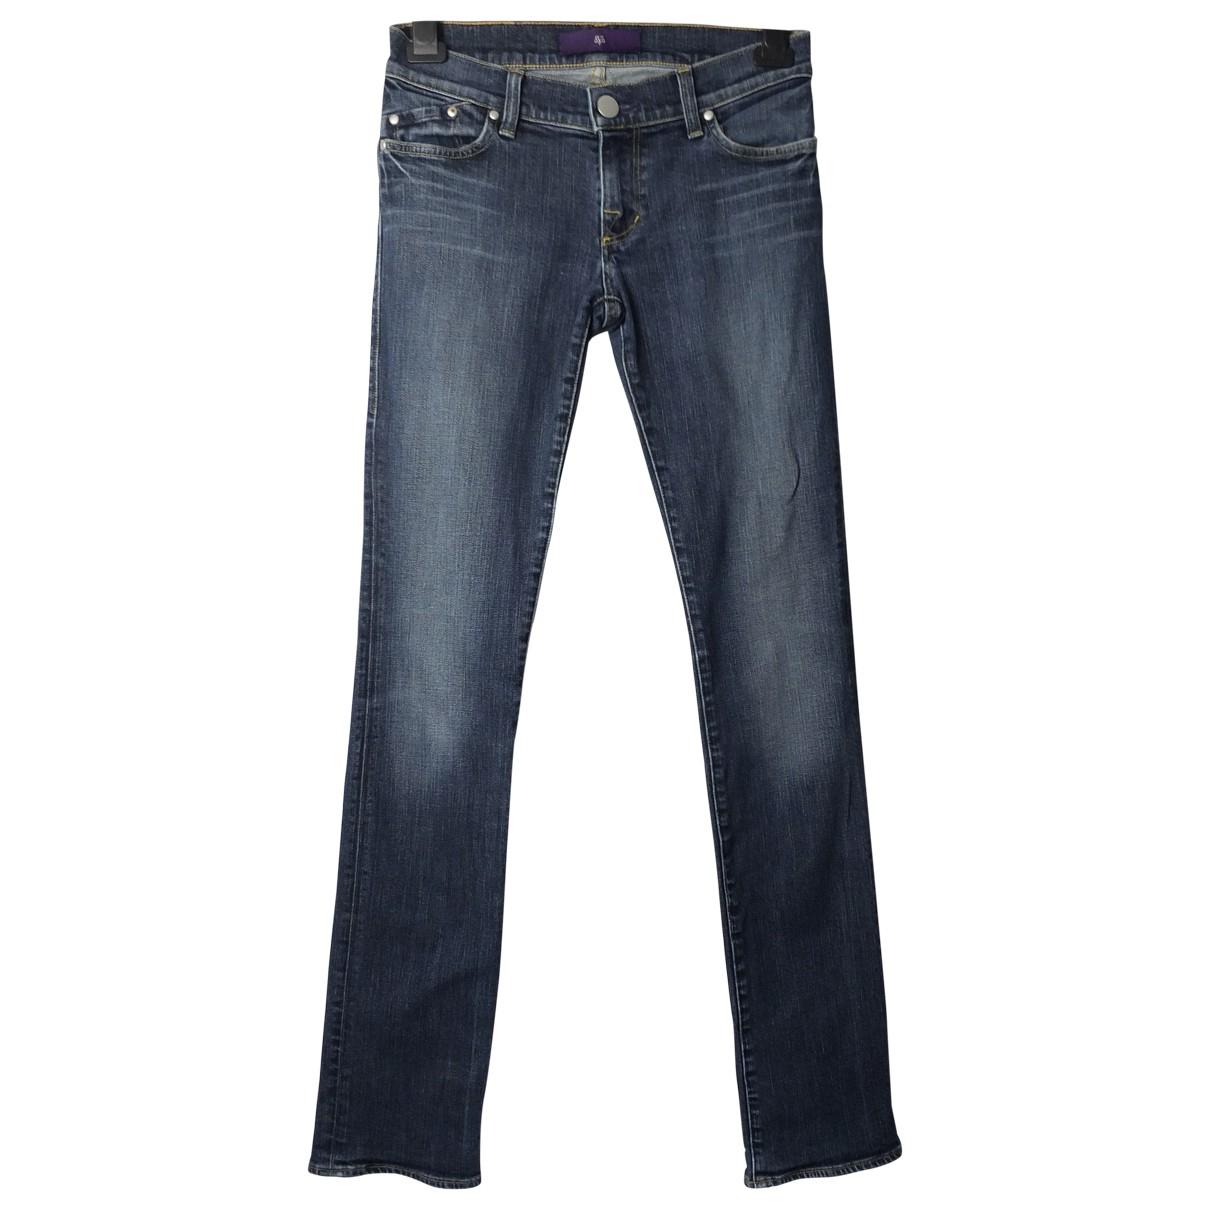 Victoria Beckham \N Blue Cotton - elasthane Jeans for Women 27 US